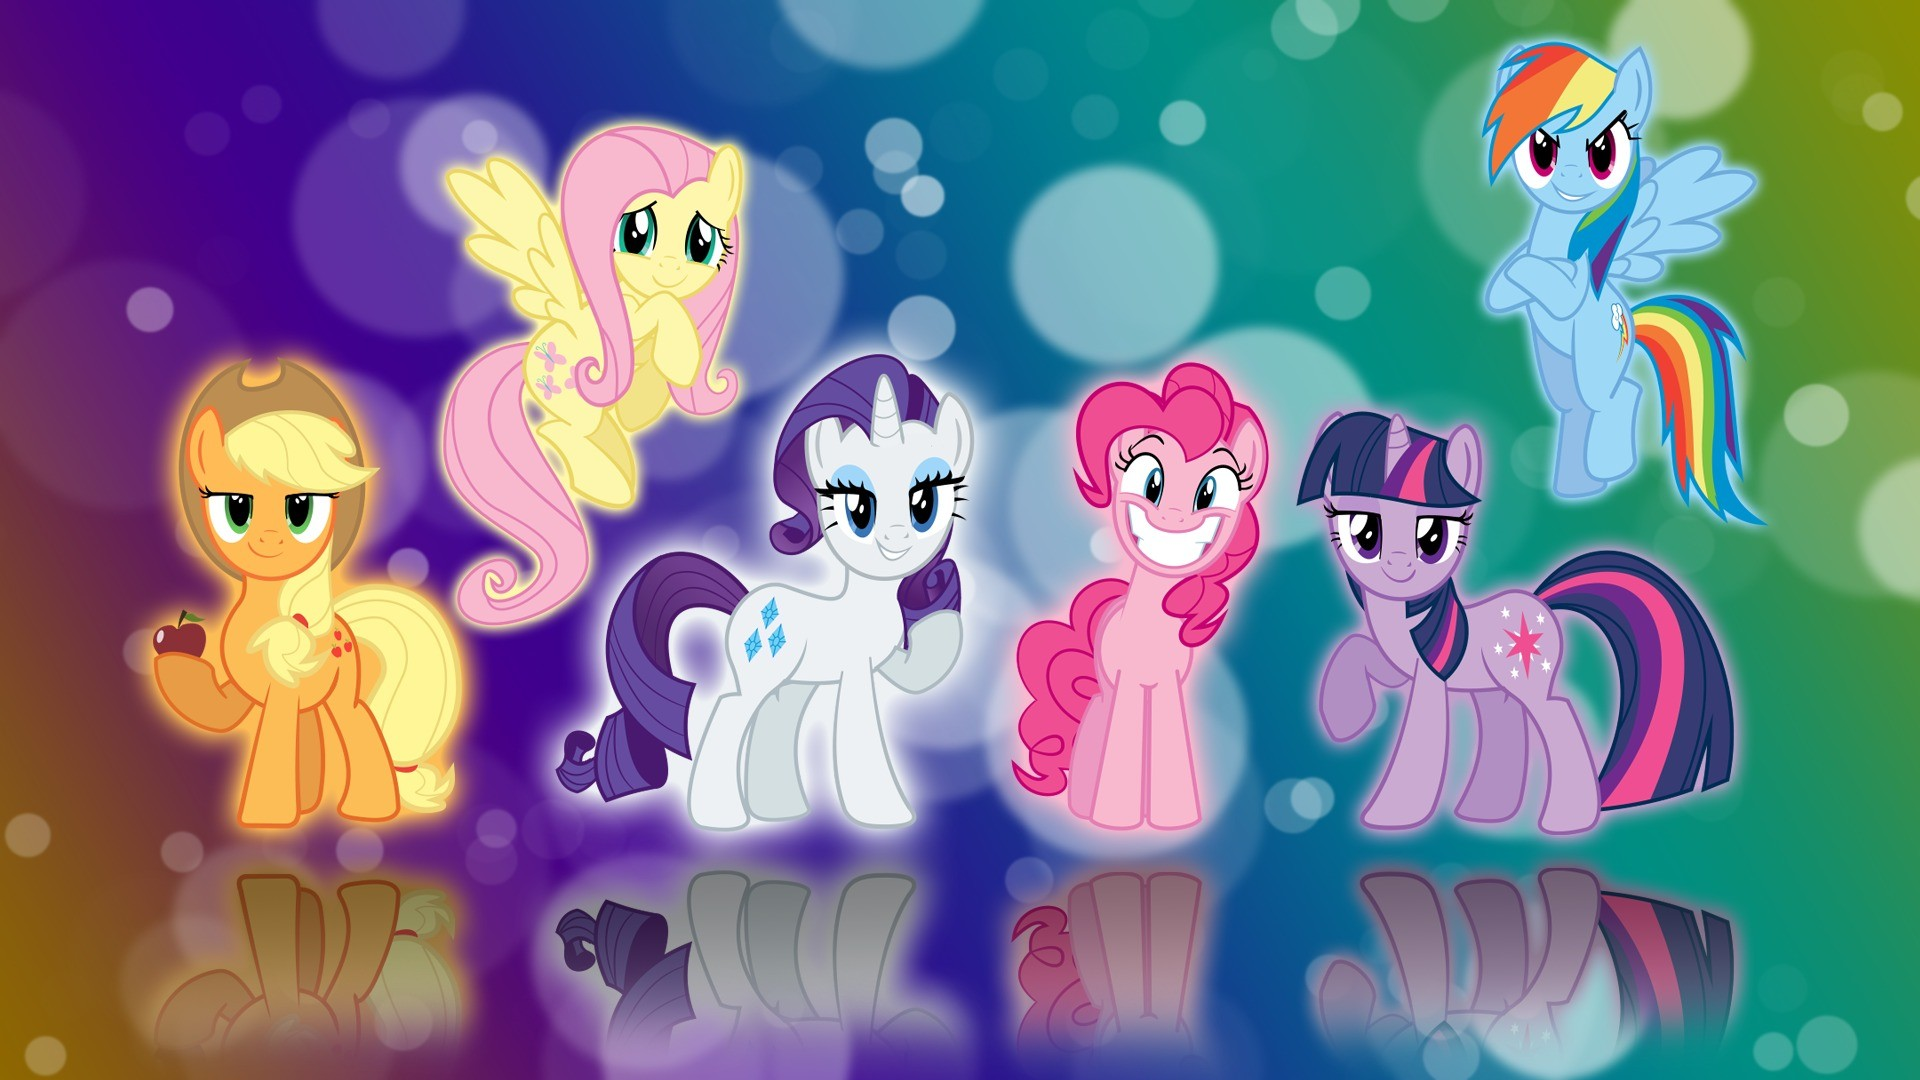 MLP Background Ponies Wallpaper (82+ images)